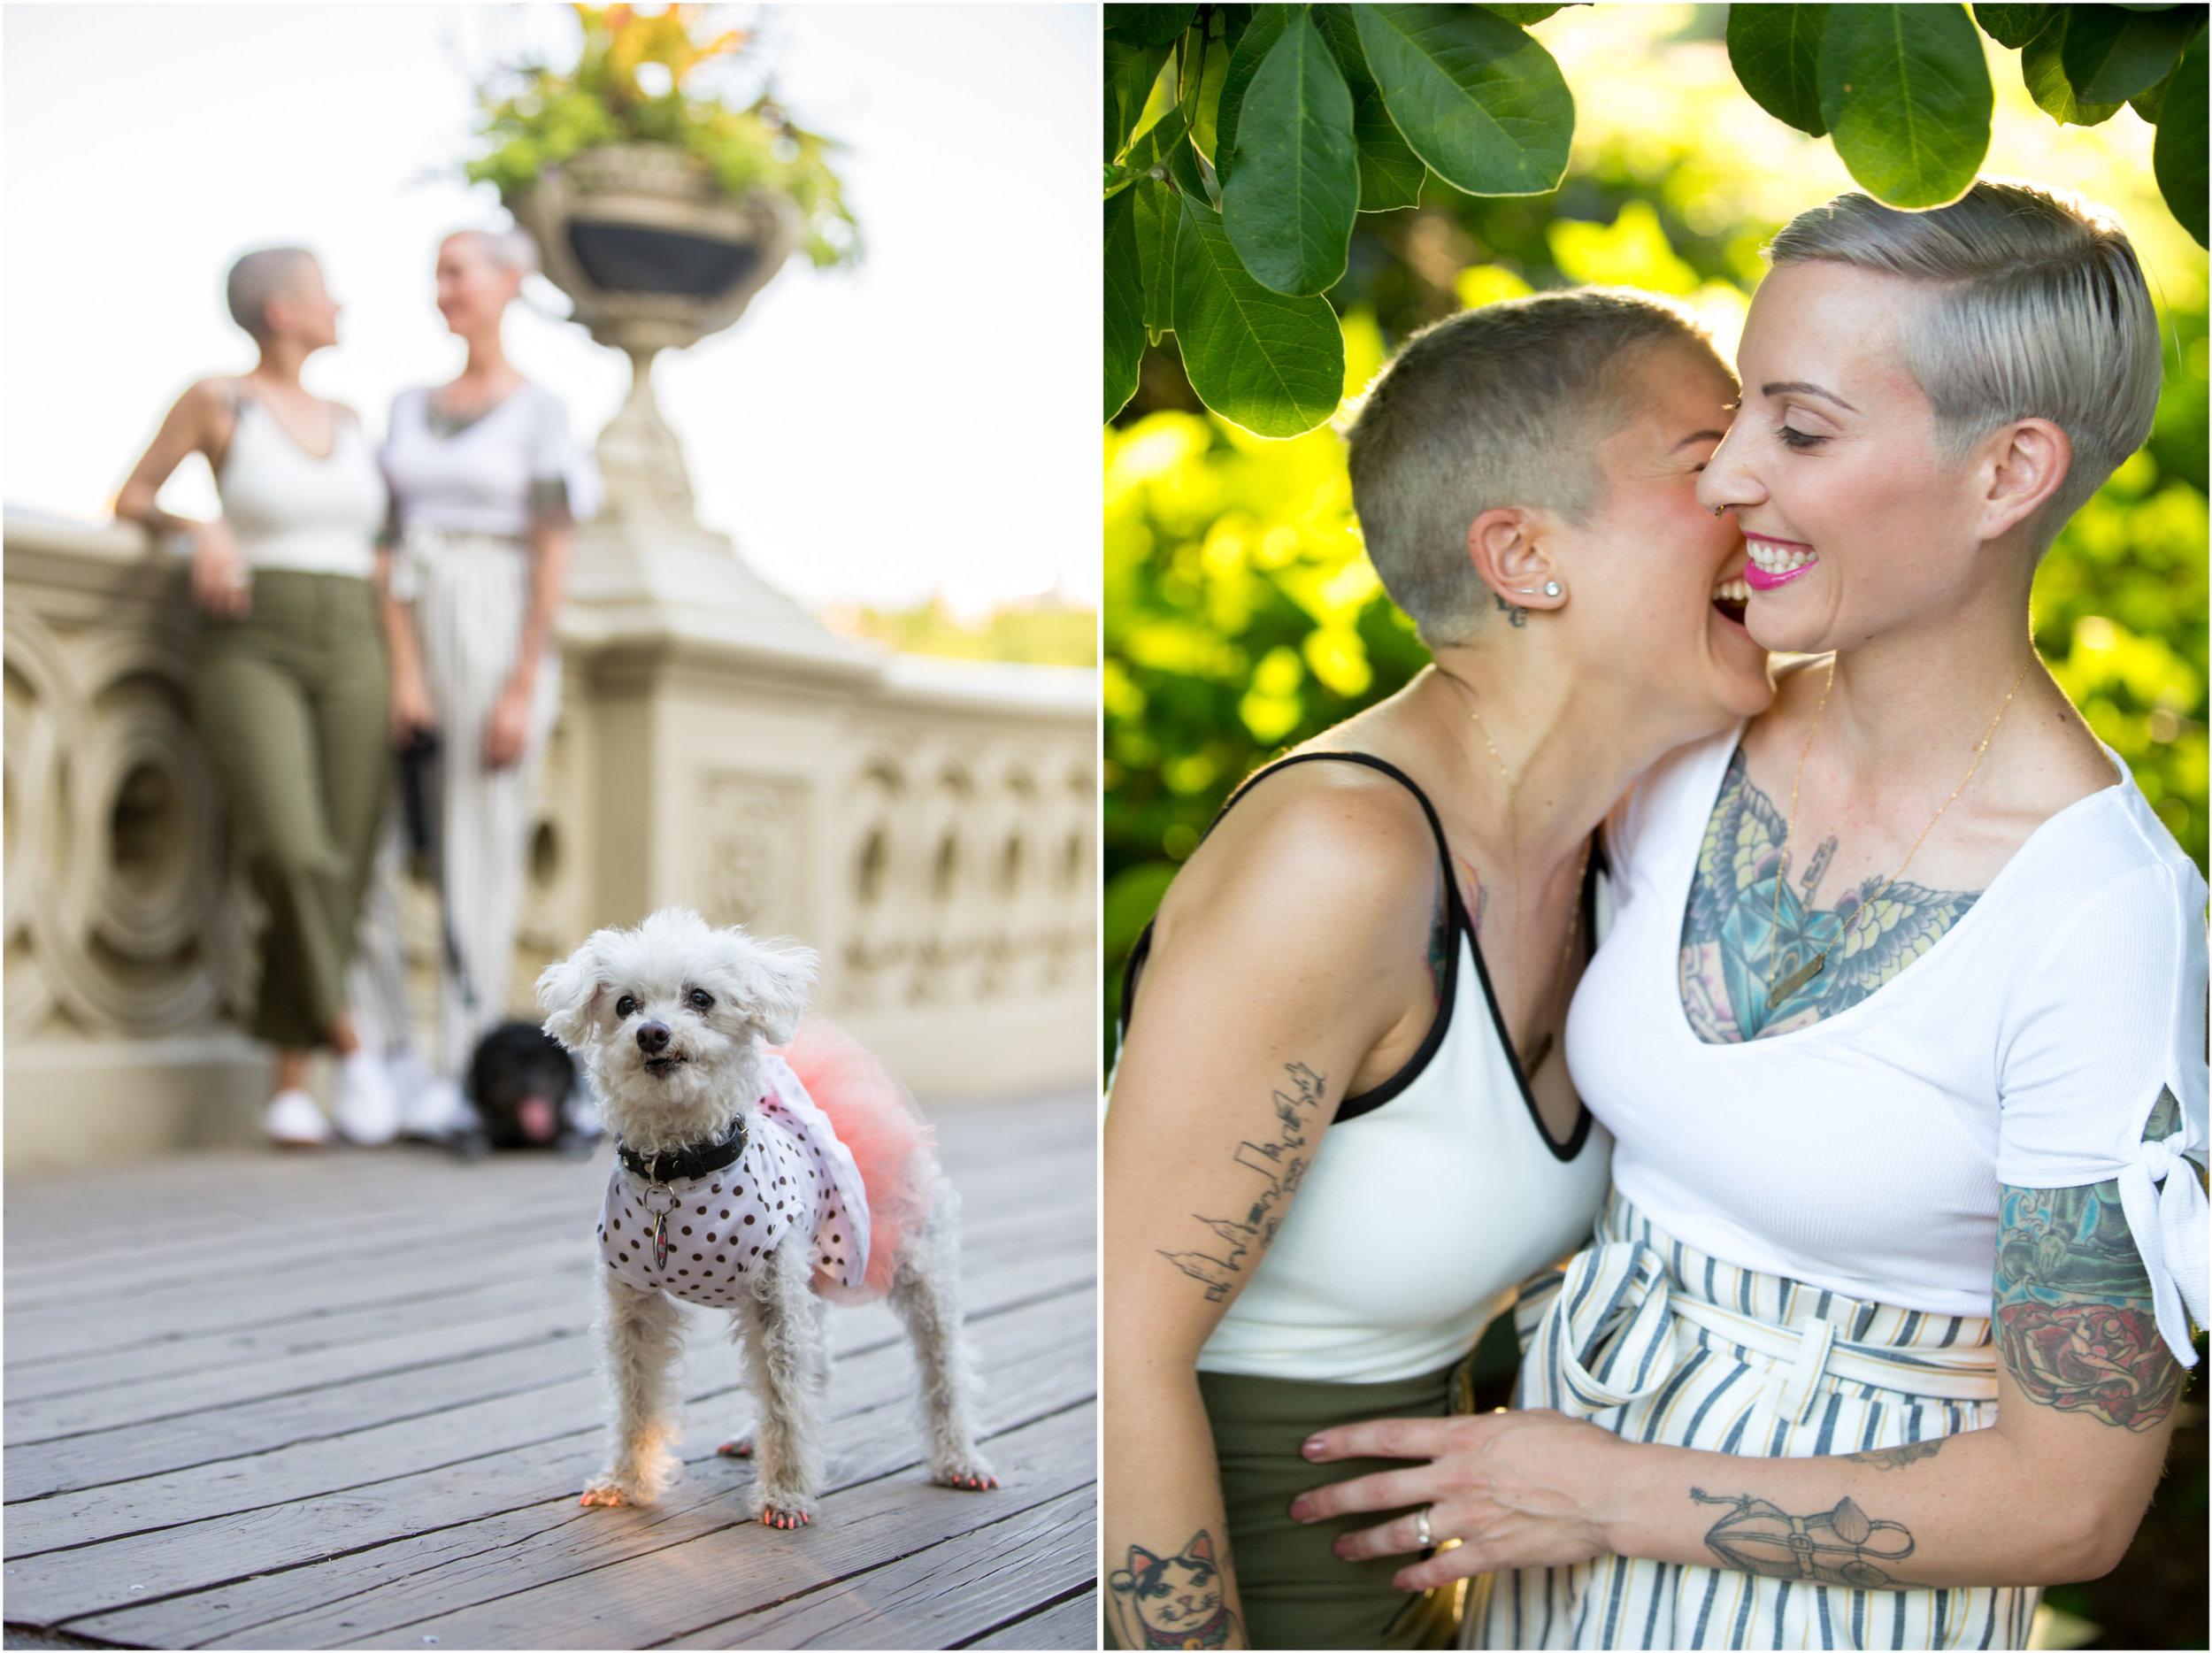 NYC Engagement Photo Session Shoot Central Park Same Sex Lesbian Dog Photographer-10.jpg